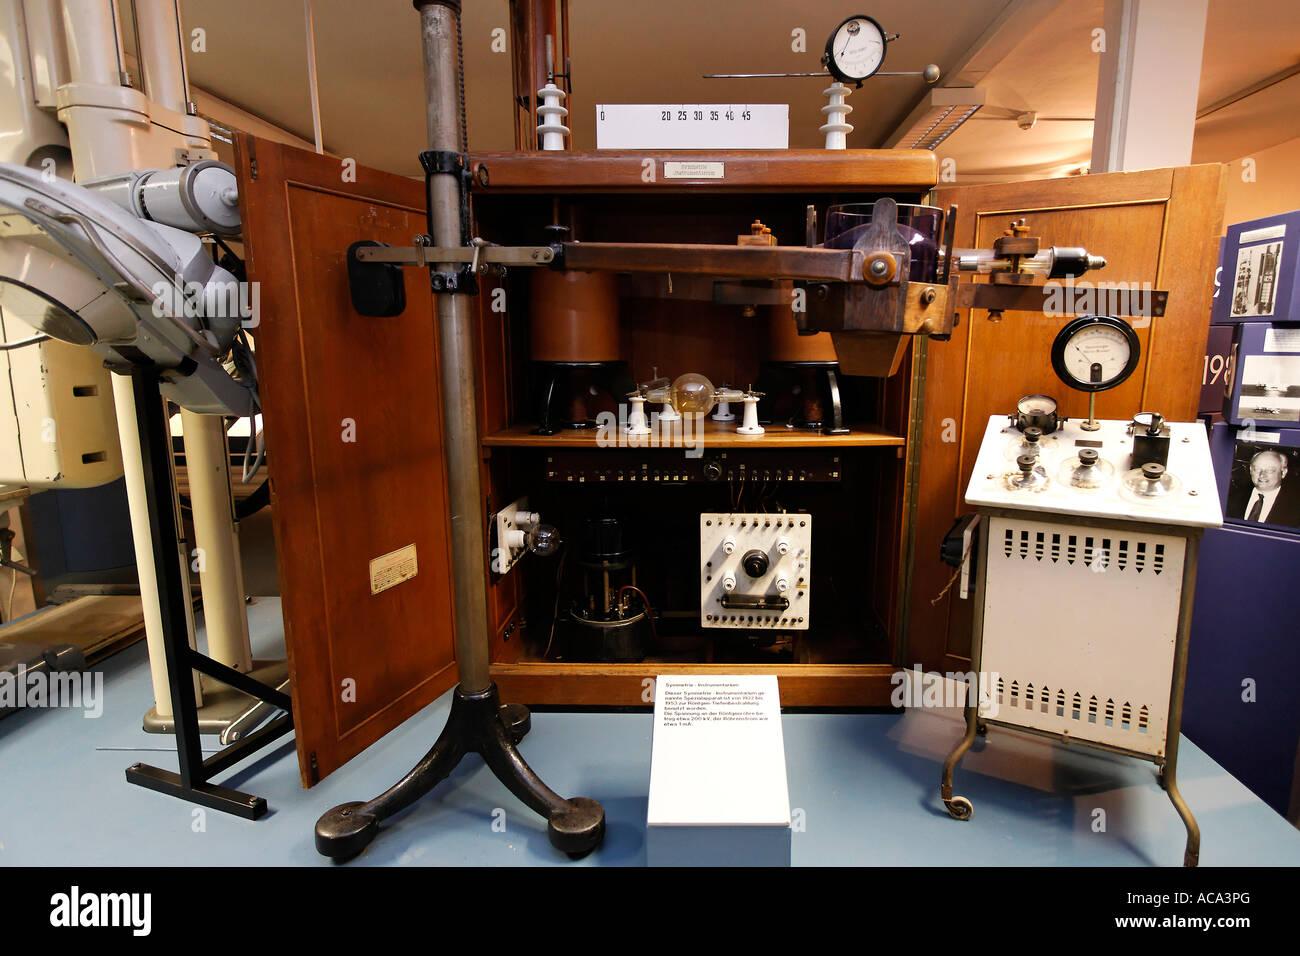 Roentgen deep therapy device, exhibit at German Roentgen Museum, Remscheid-Lennep, Germany Stock Photo